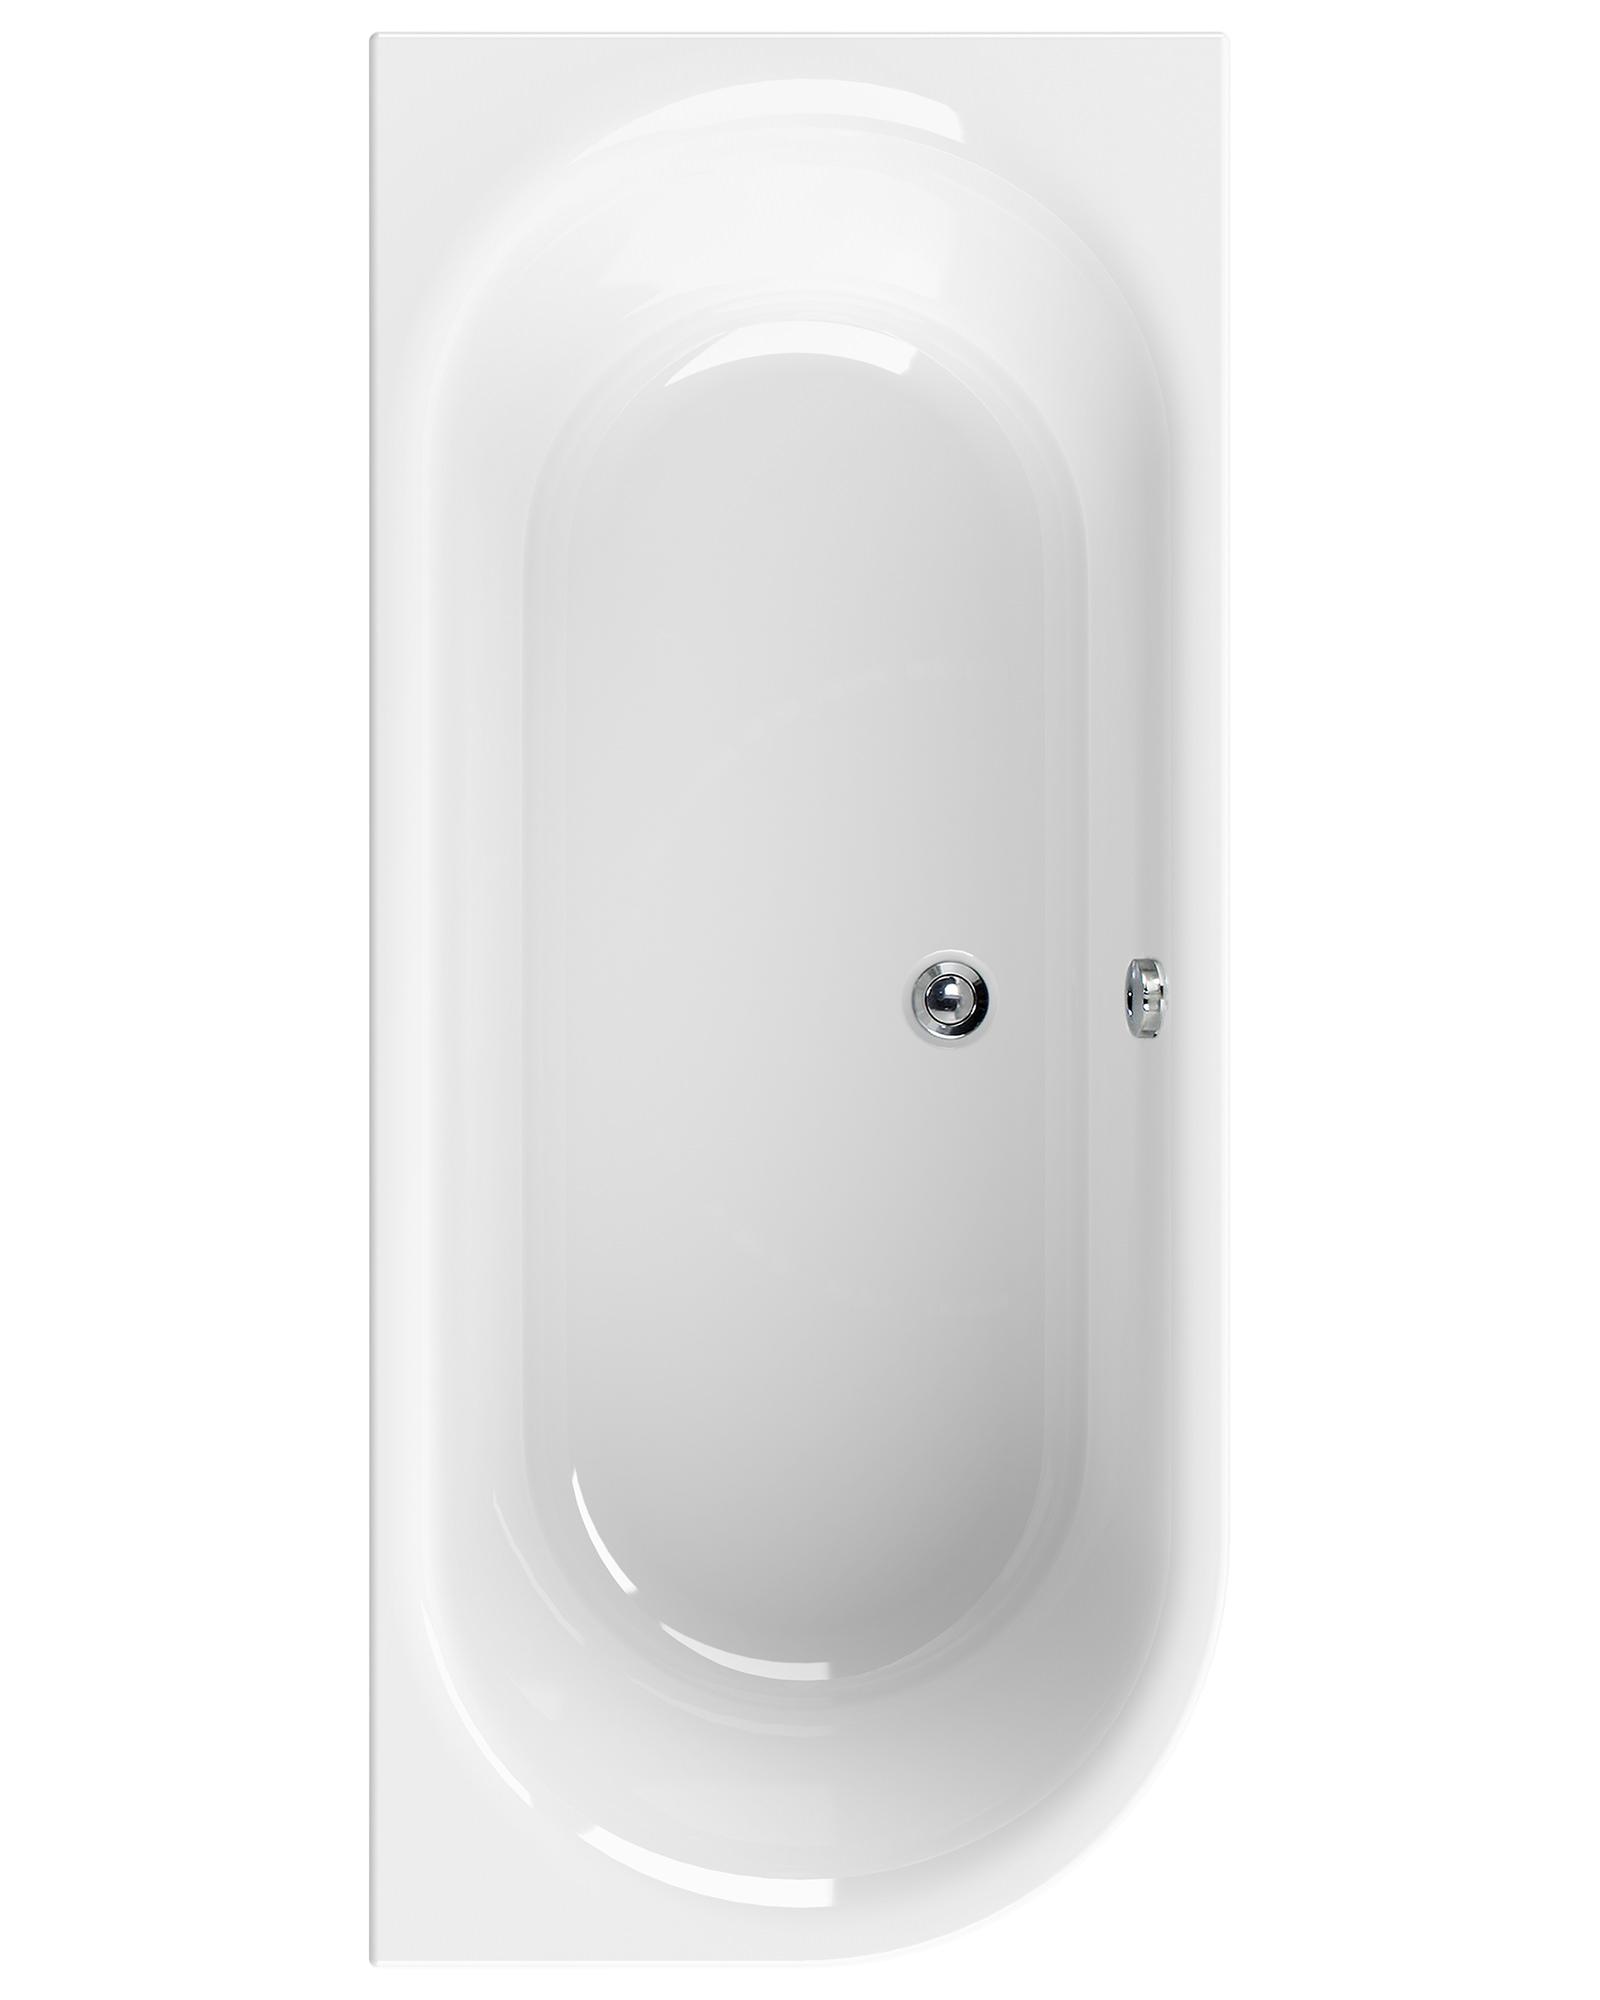 100 curved shower screens for corner baths camden corner curved shower screens for corner baths corner baths small corner bath large corner placements baths